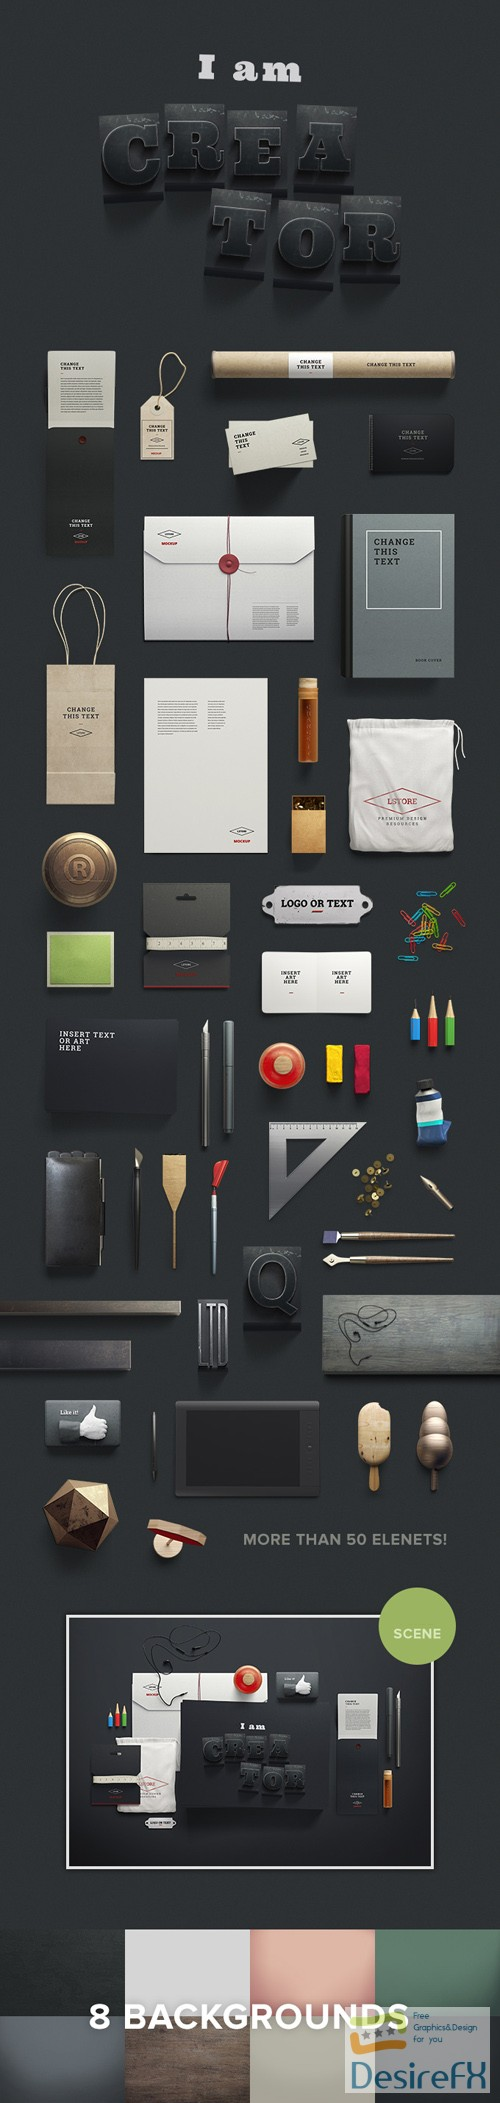 50+ Stationary PSD Mockups Elements